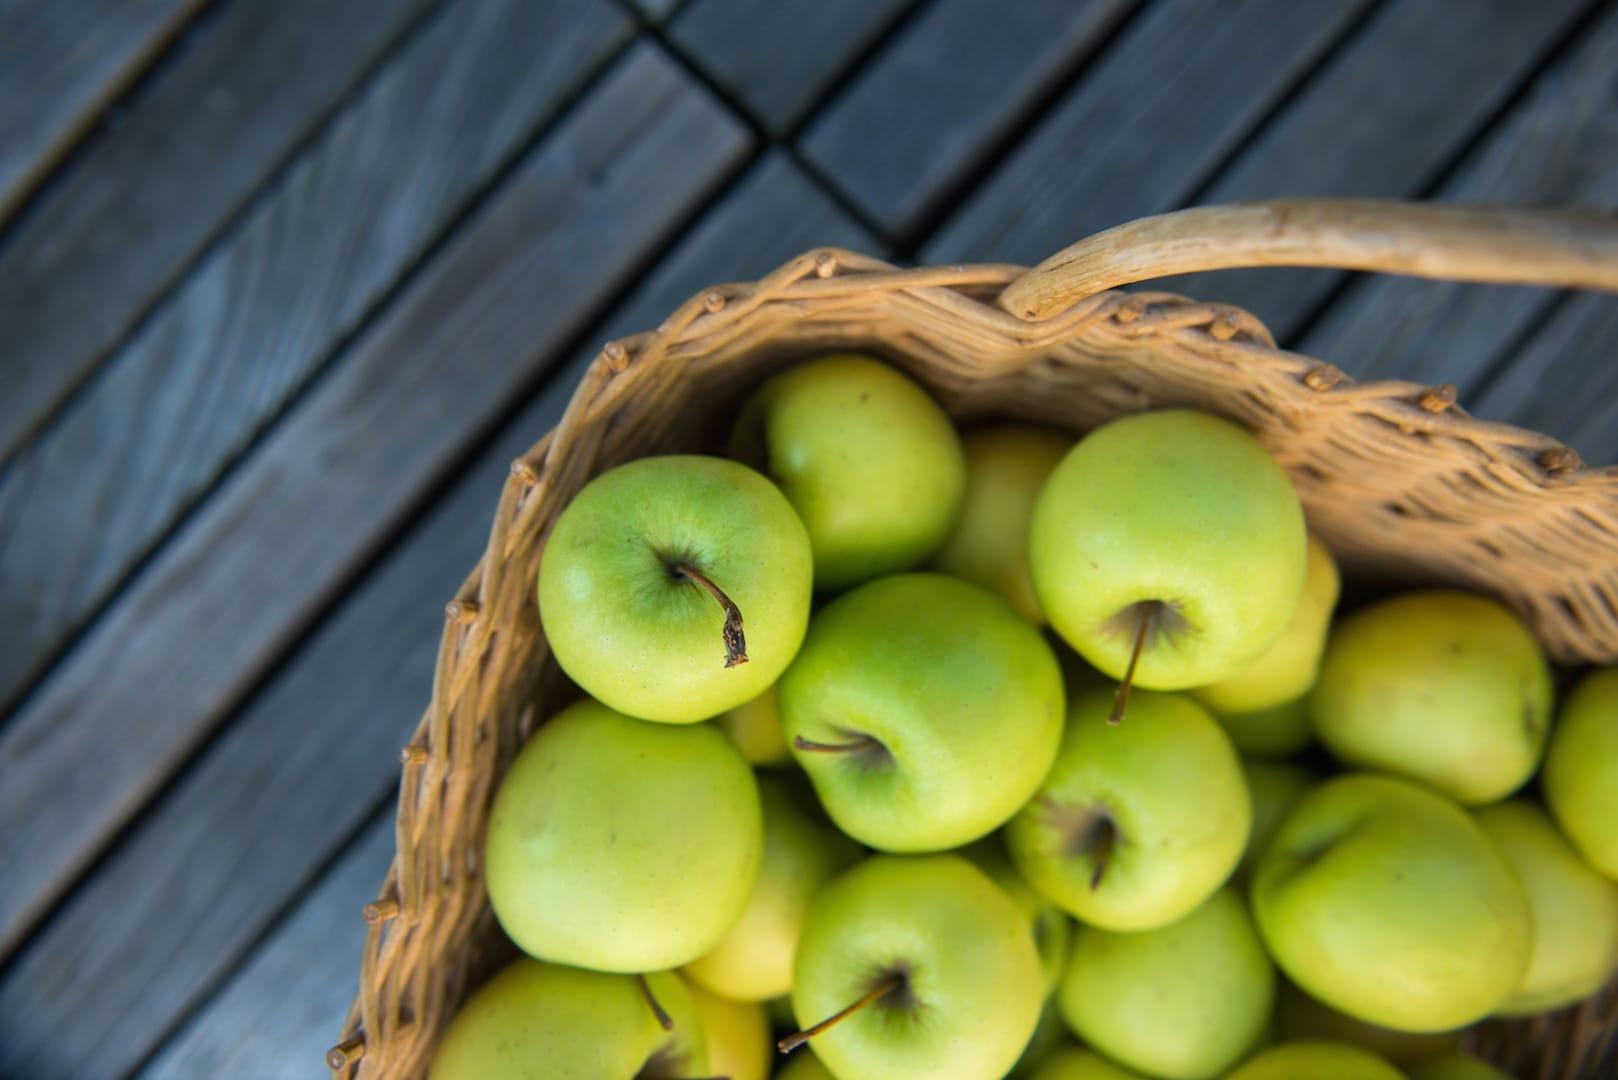 Slovenian Apples_www.slovenia.info_Nea Culpa